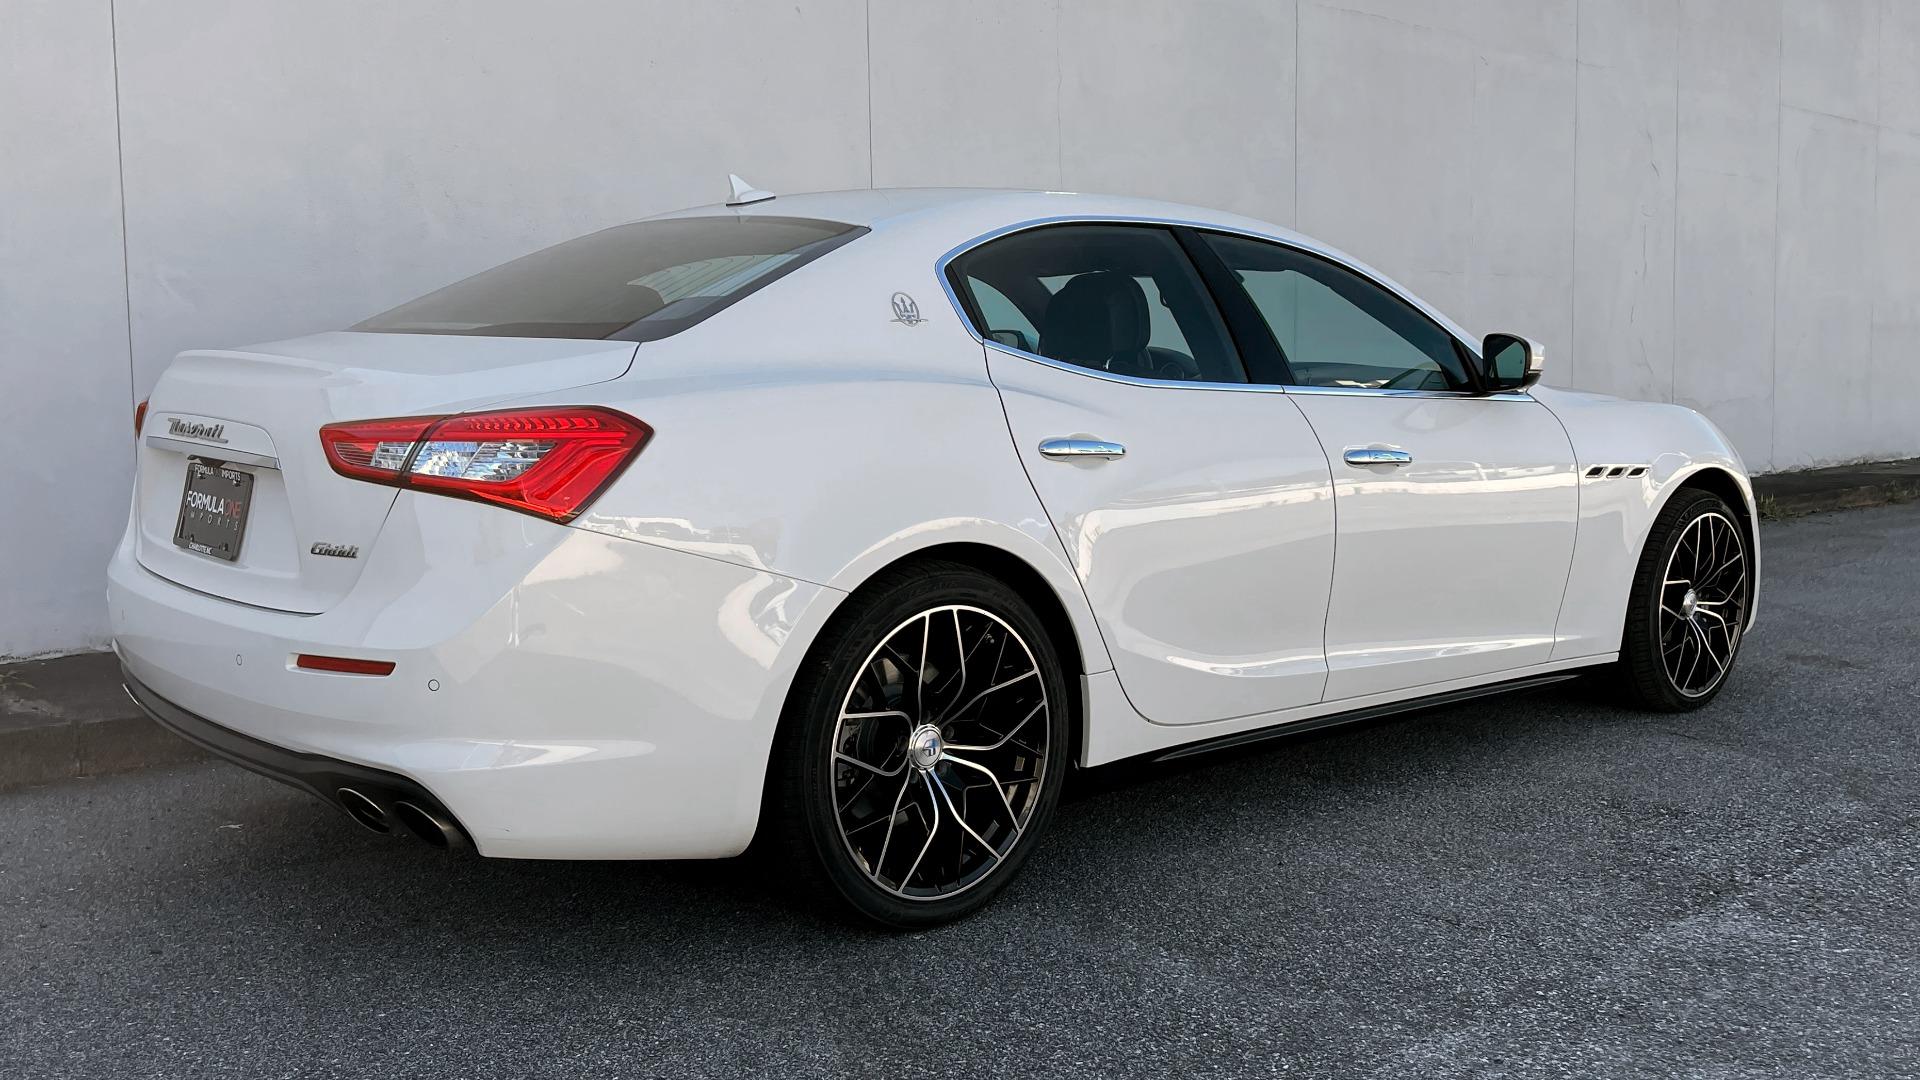 Used 2018 Maserati GHIBLI SEDAN / RWD / 3.0L V6 / SUNROOF / NAV / REARVIEW for sale $42,995 at Formula Imports in Charlotte NC 28227 7